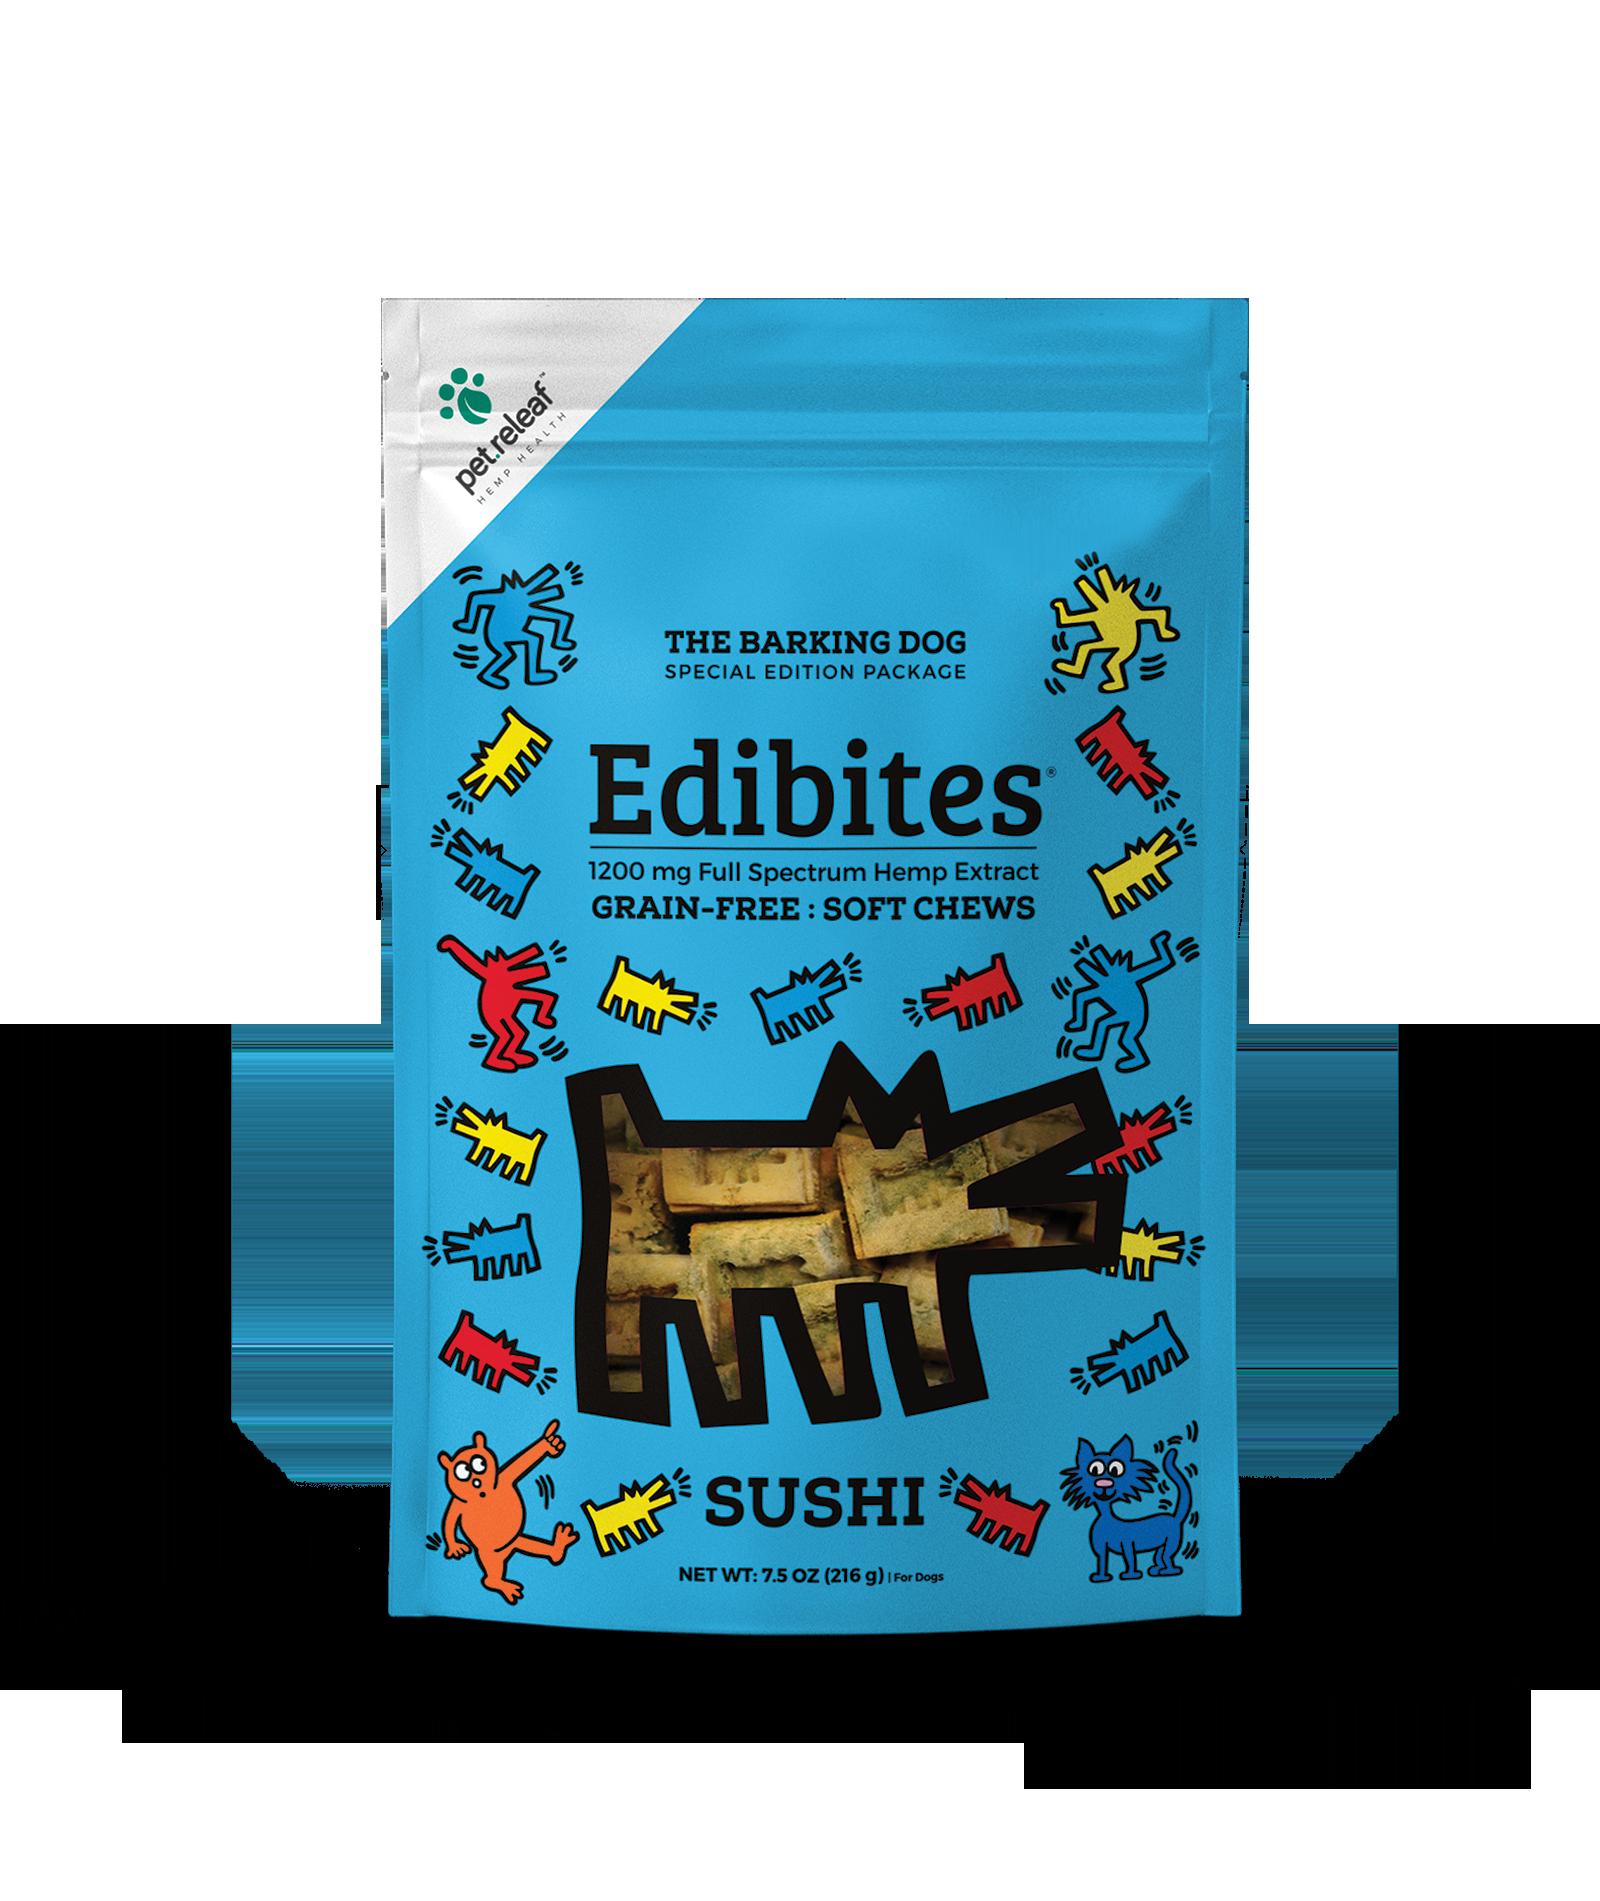 Pet Releaf Pet Releaf KH Edibites Sushi Soft Chews CBD Supplement 7.5oz